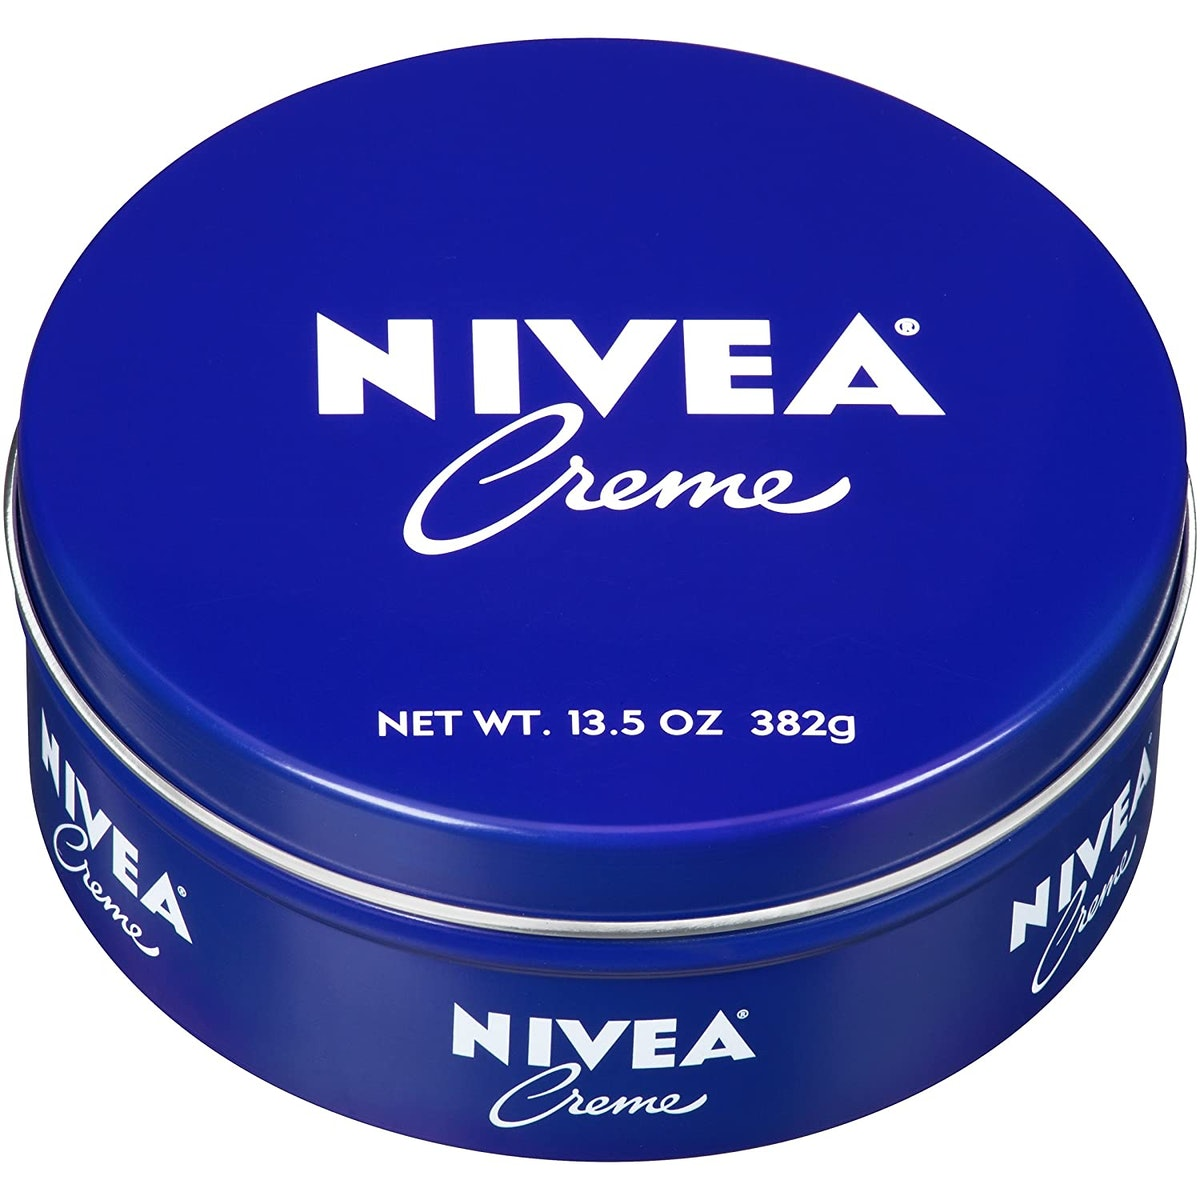 NIVEA Moisturizing Cream (13.5 Fl. Oz.)